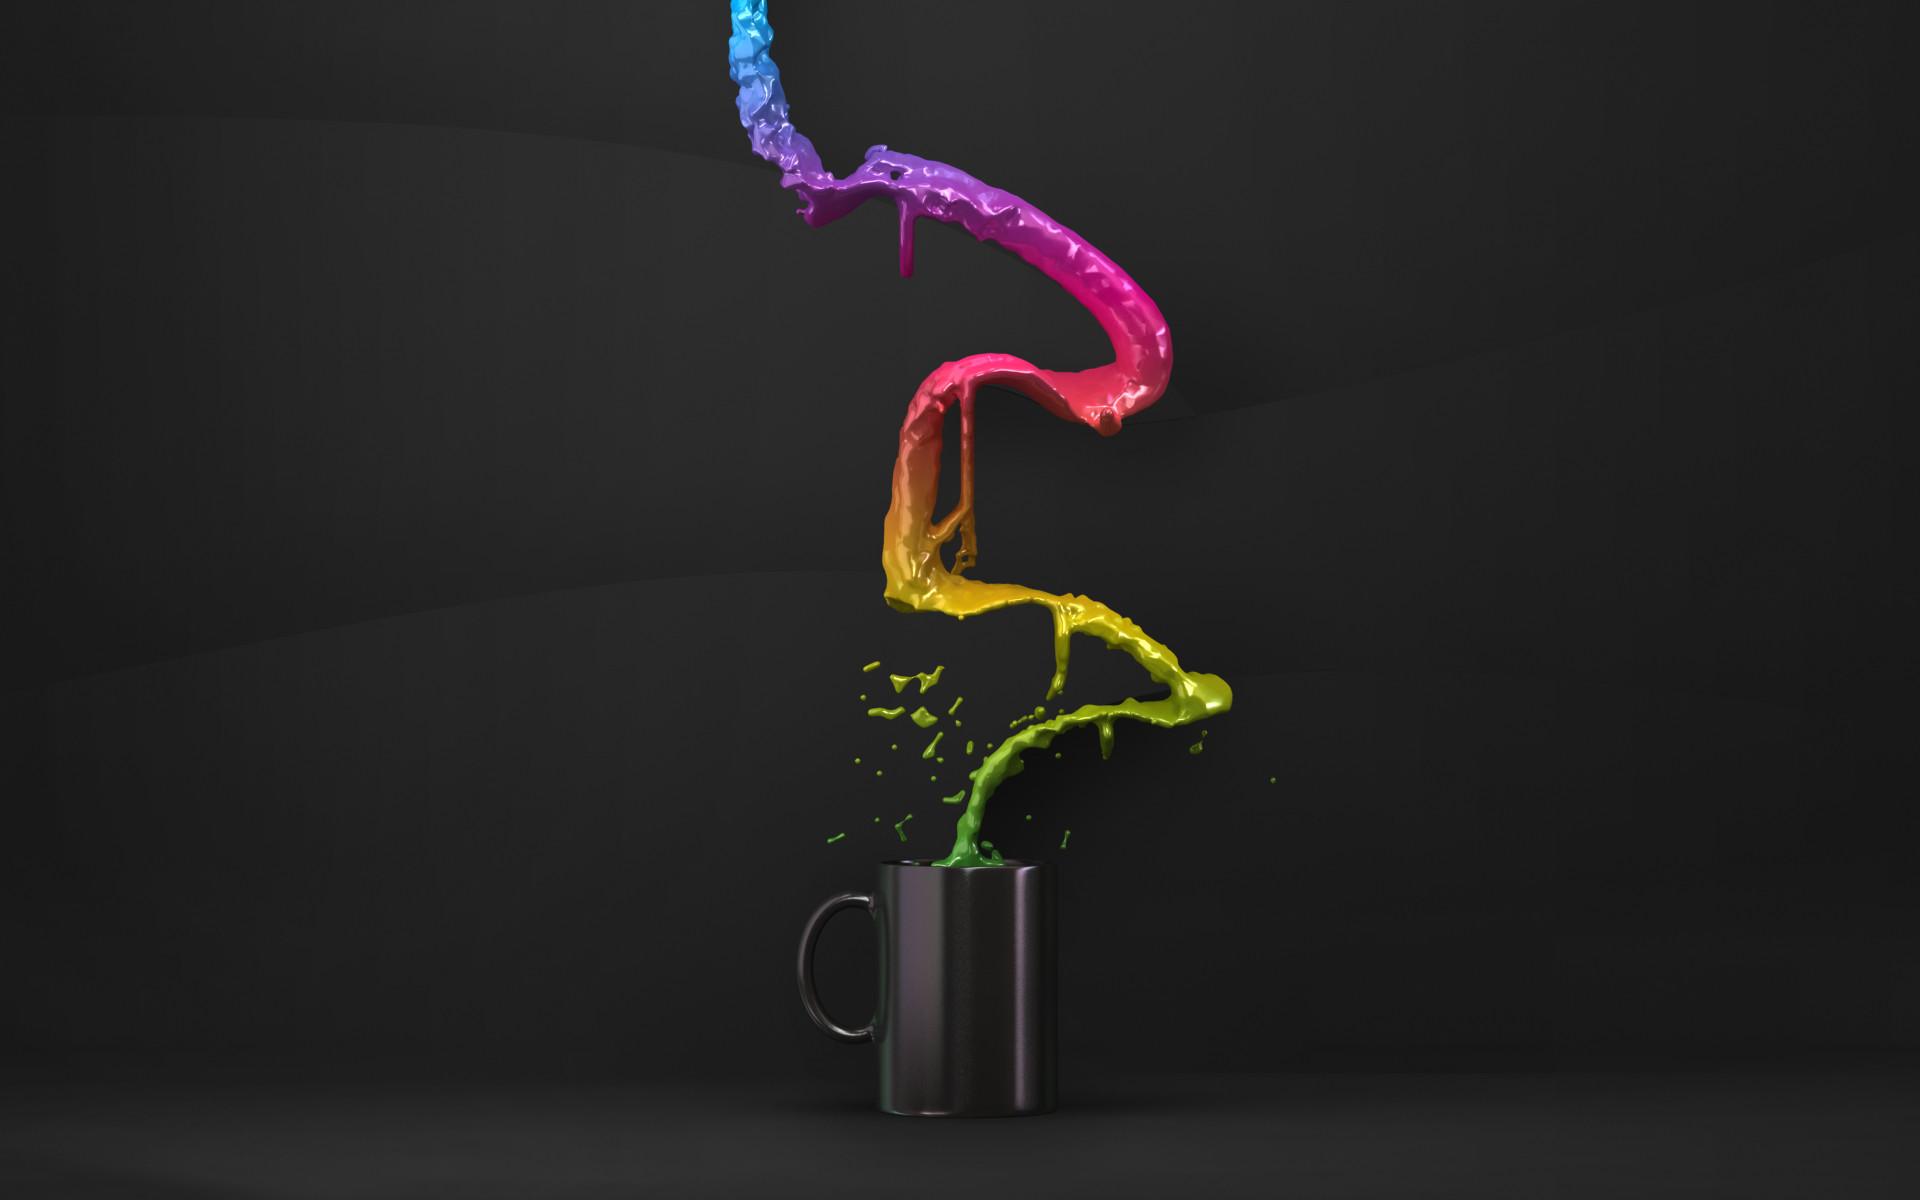 Flow Colour Hd Abstract Desktop Wallpaper